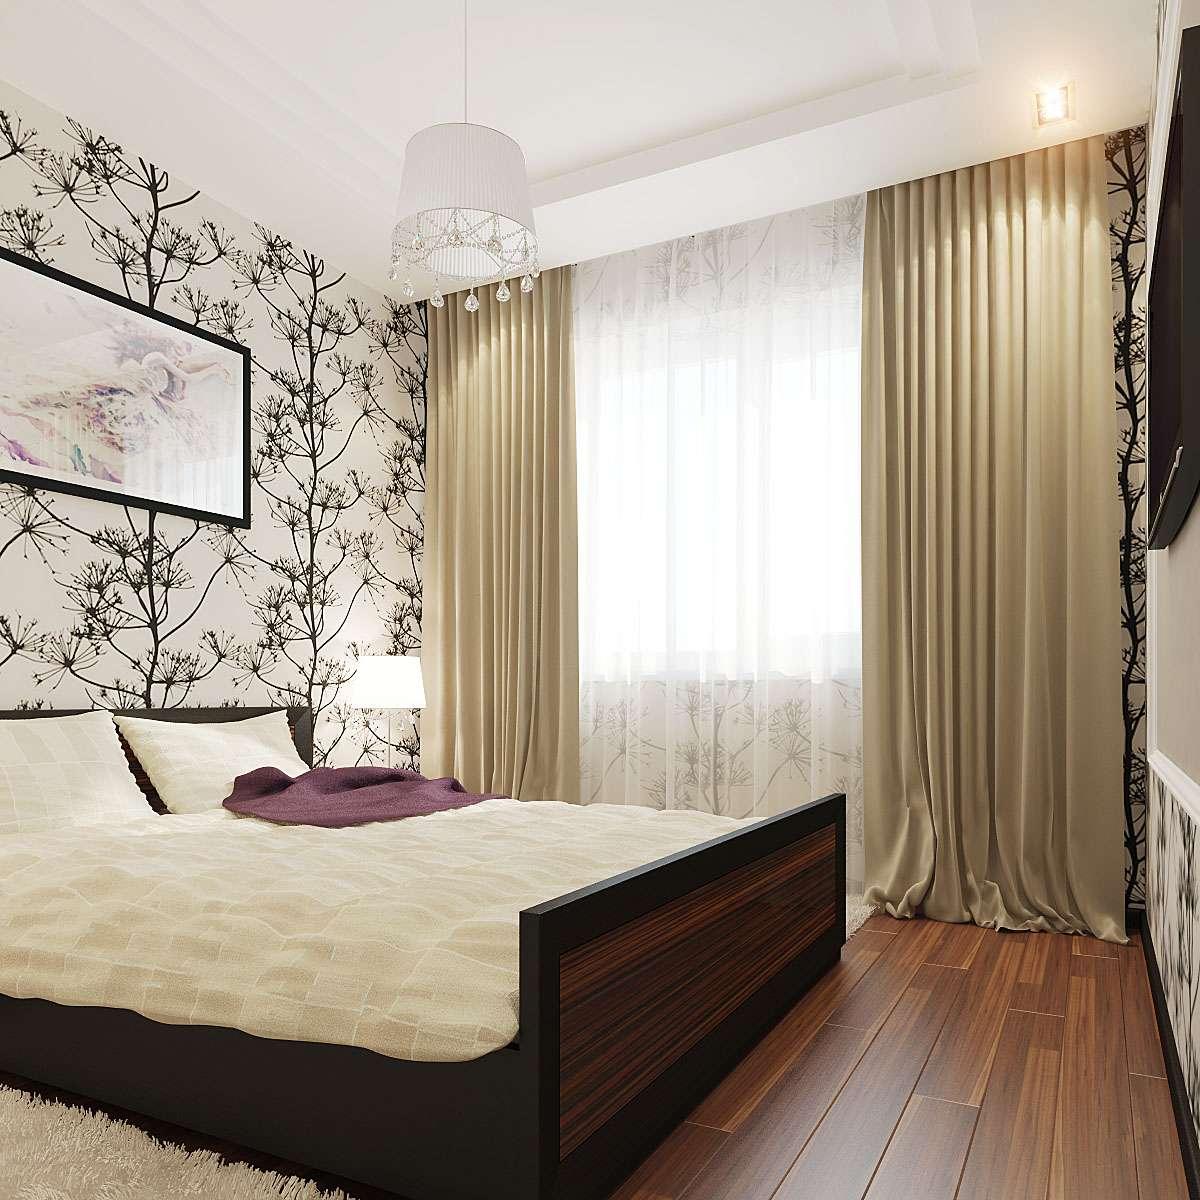 Спальня дизайн 3.5 на 3.5